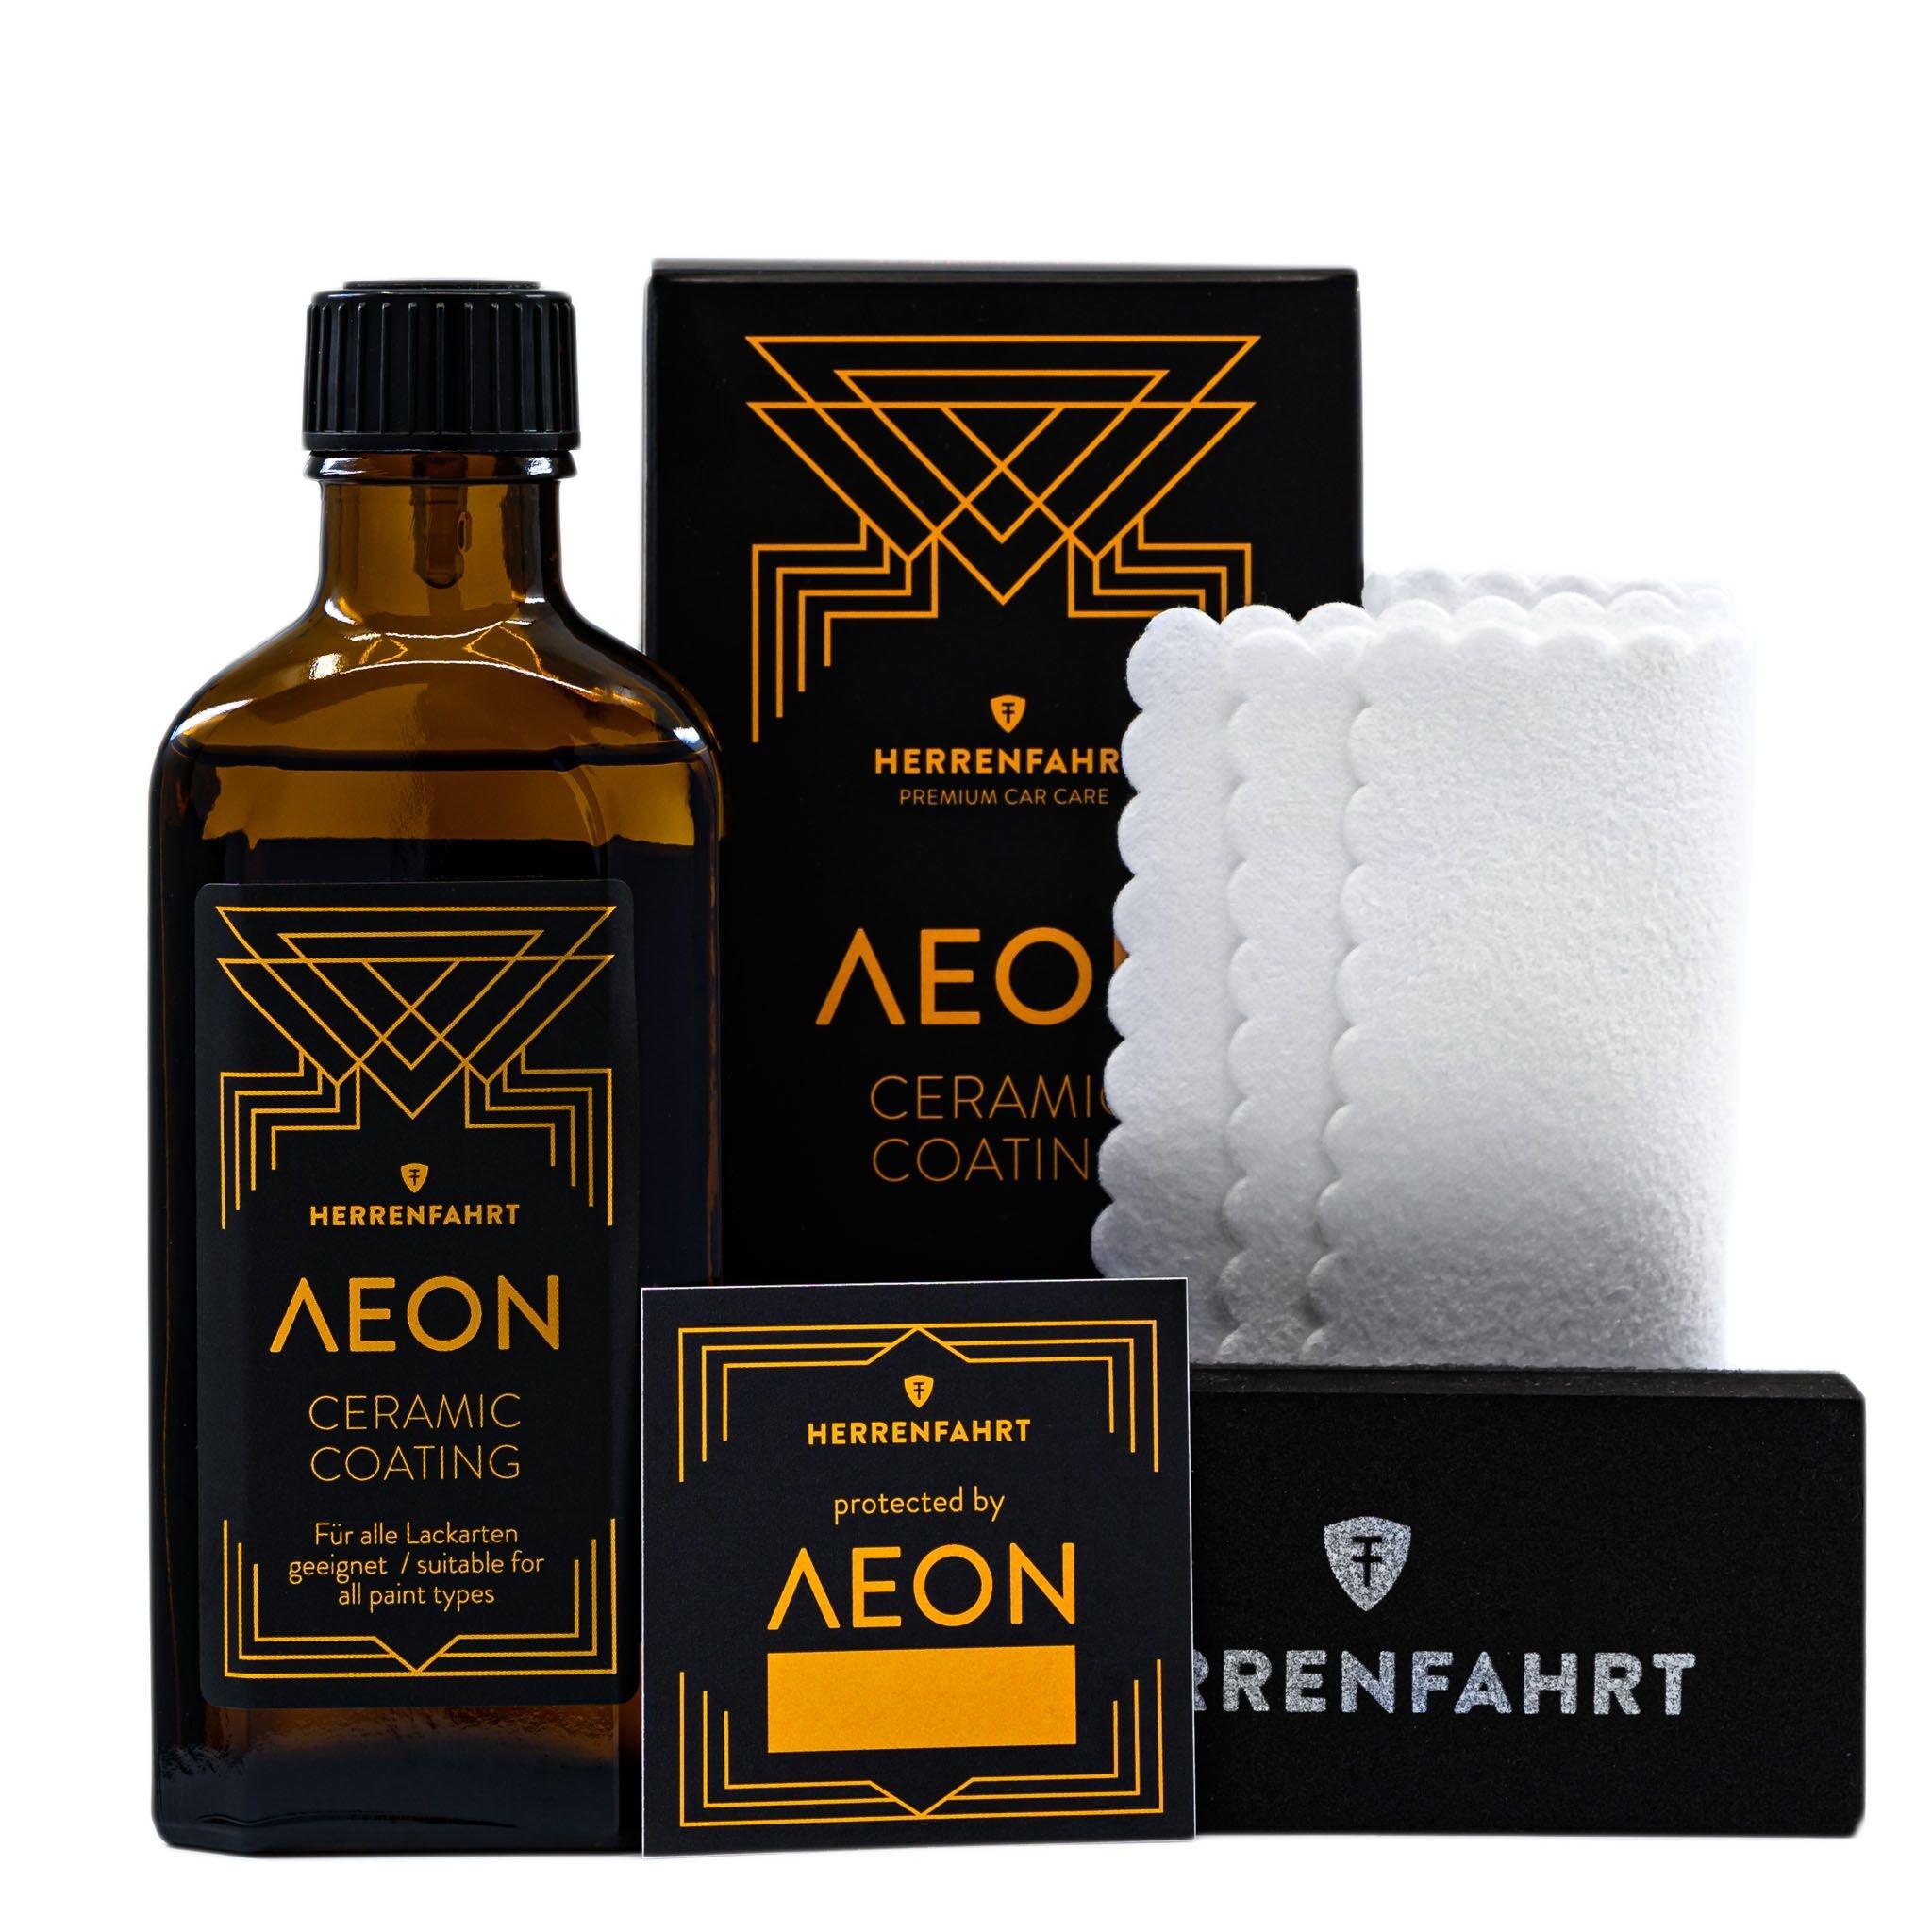 Herrenfahrt Herrenfahrt AEON Ceramic Coating